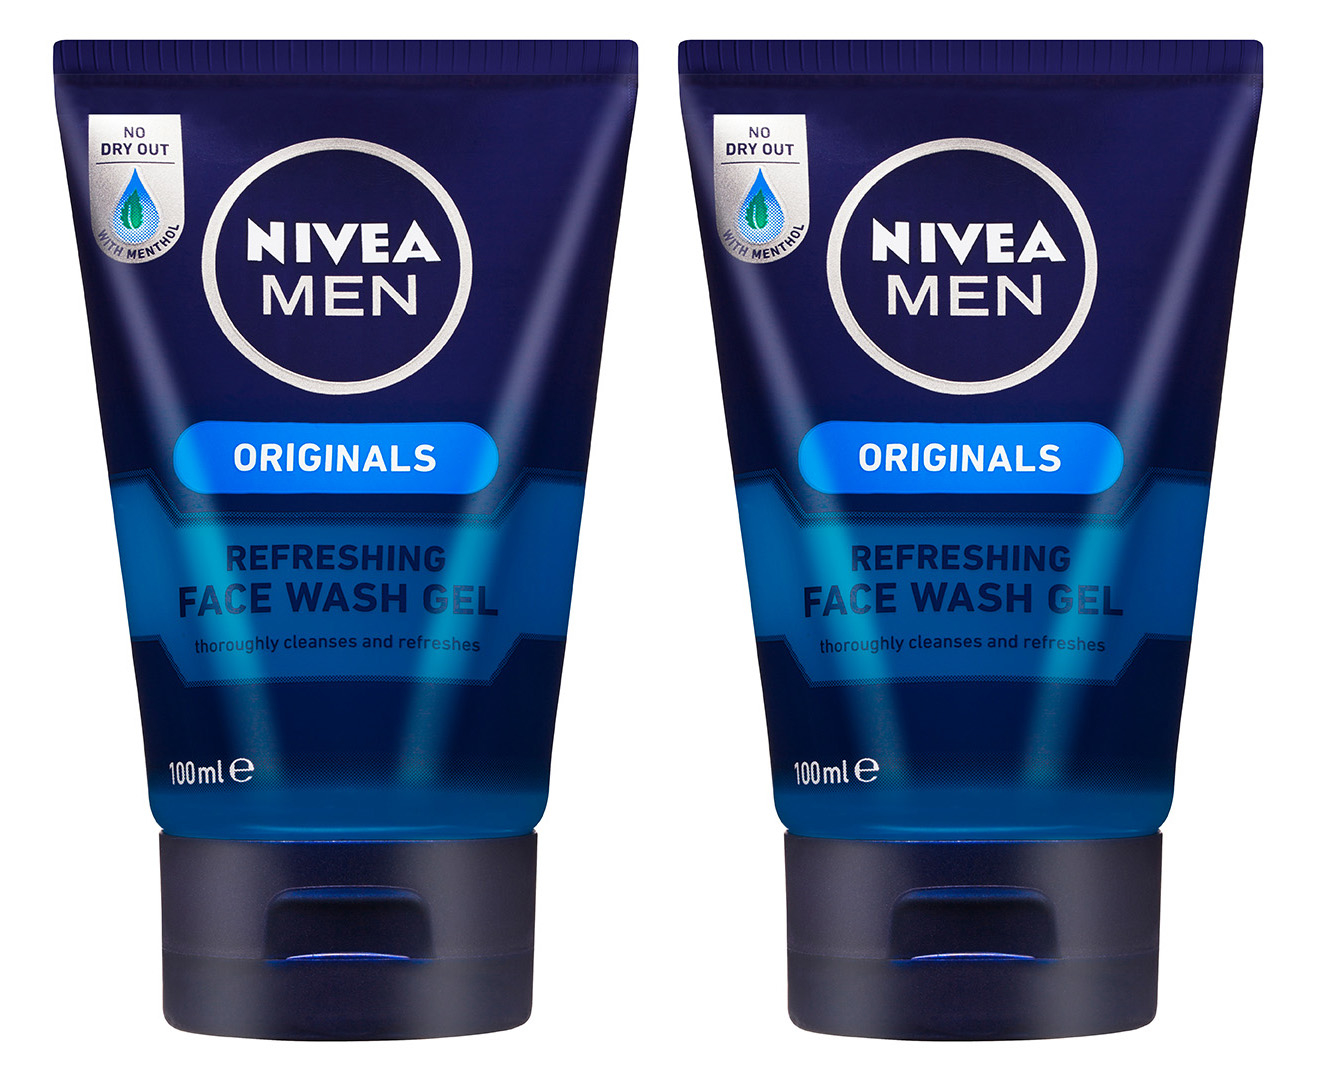 2 x Nivea Men Originals Refreshing Face Wash Gel 100mL